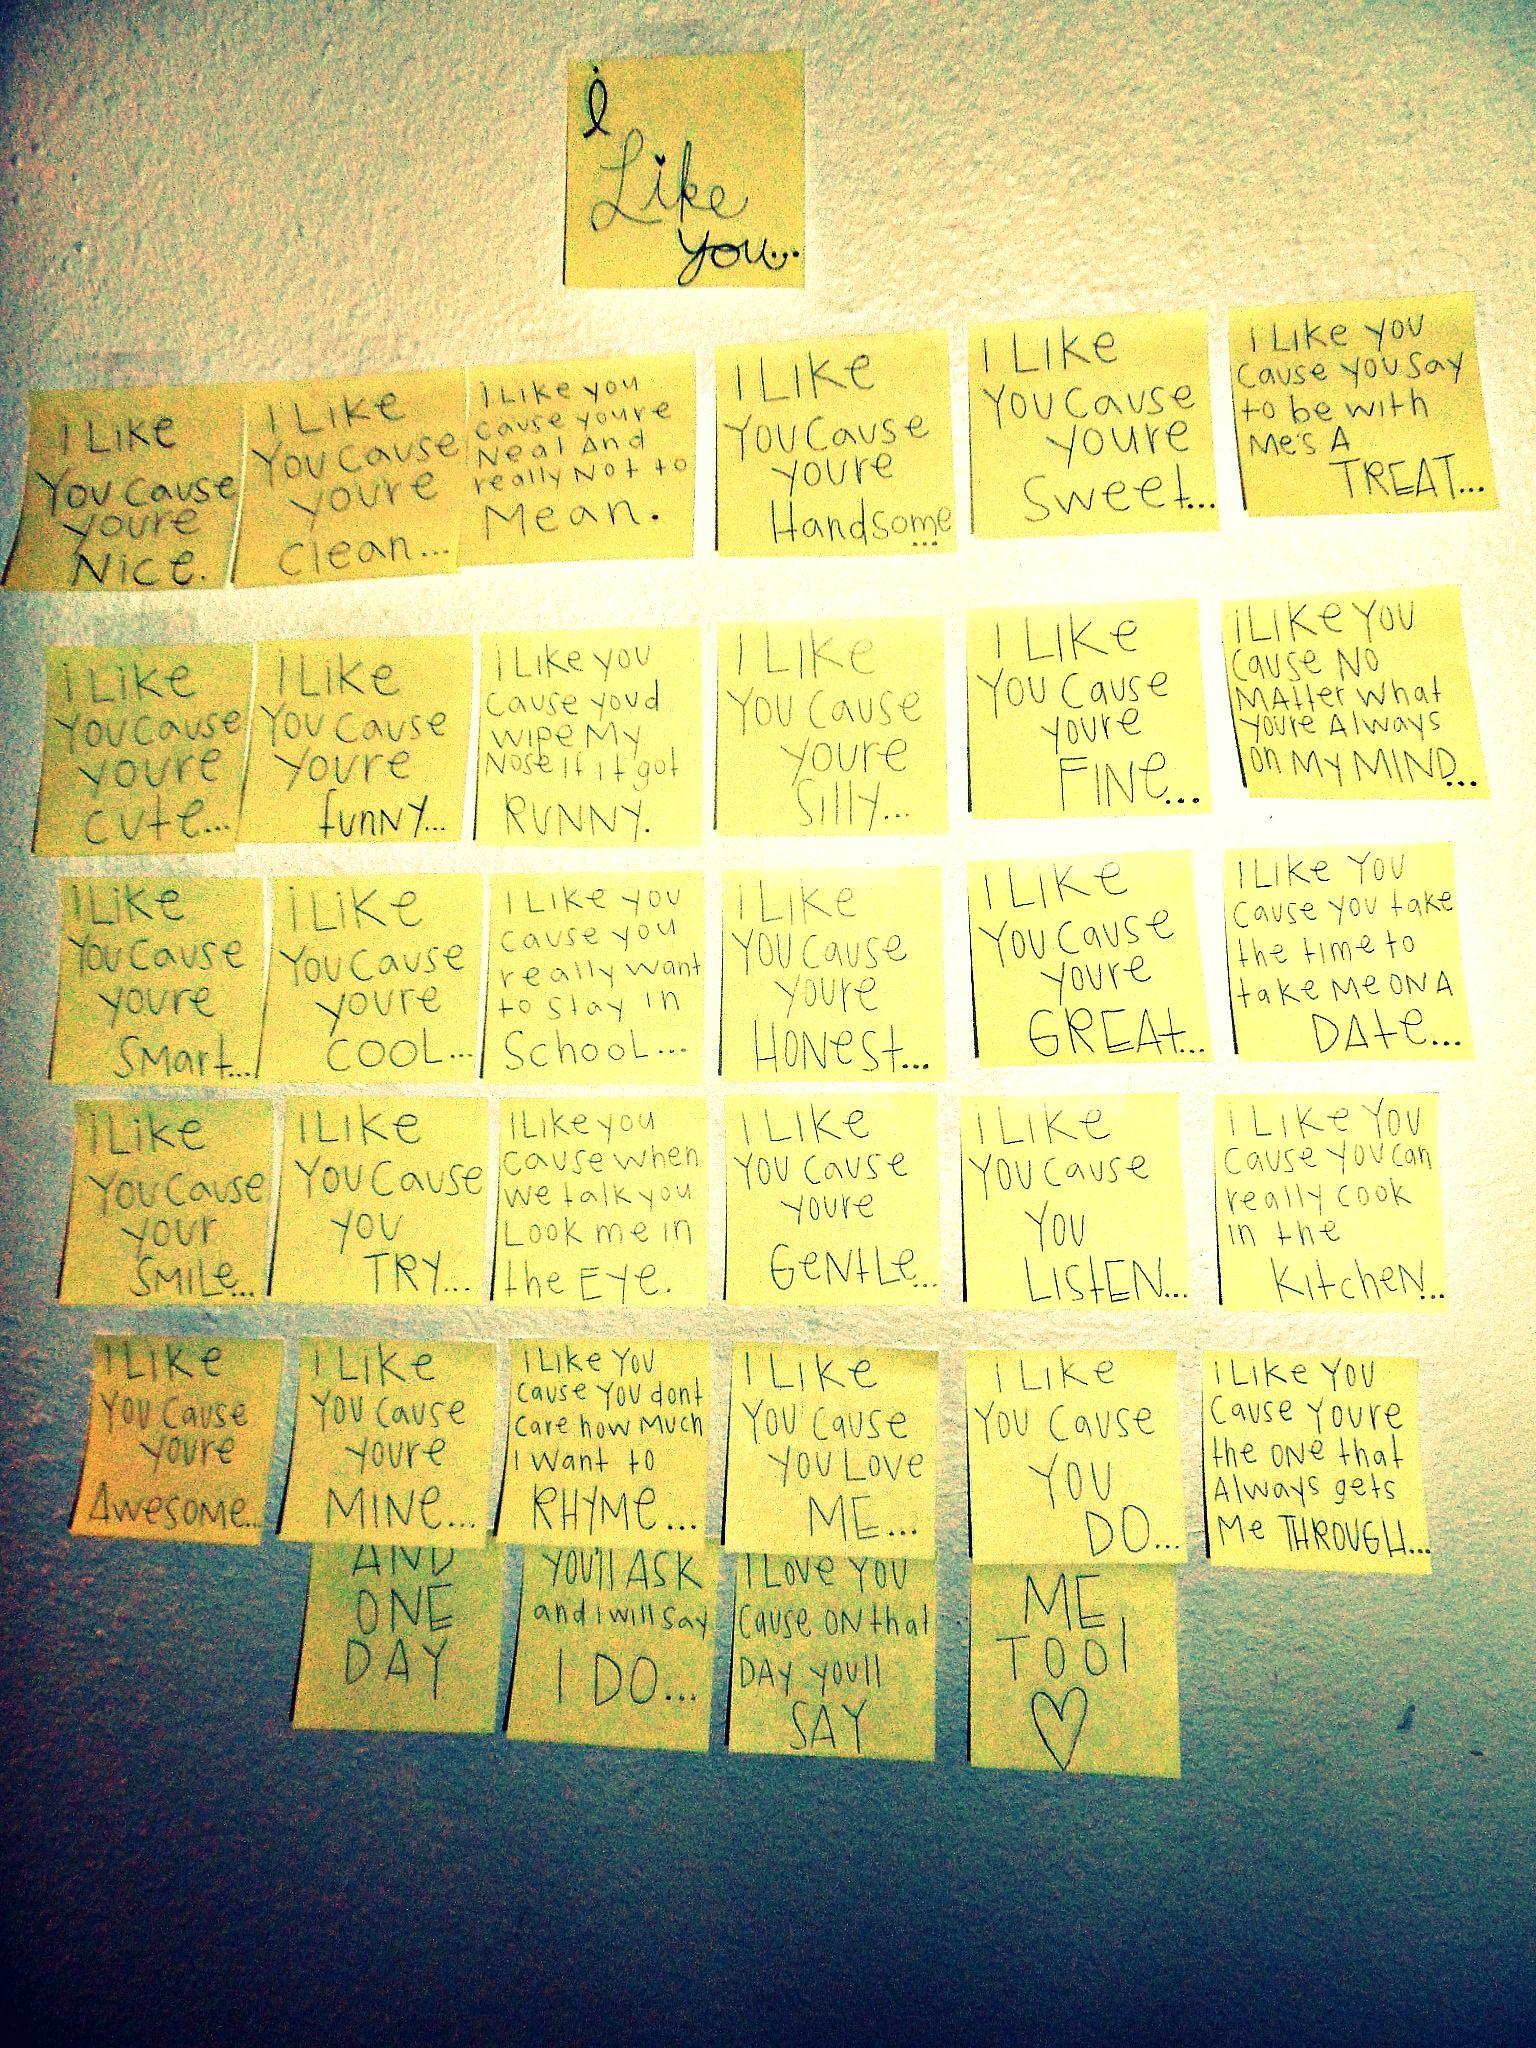 Poem notes